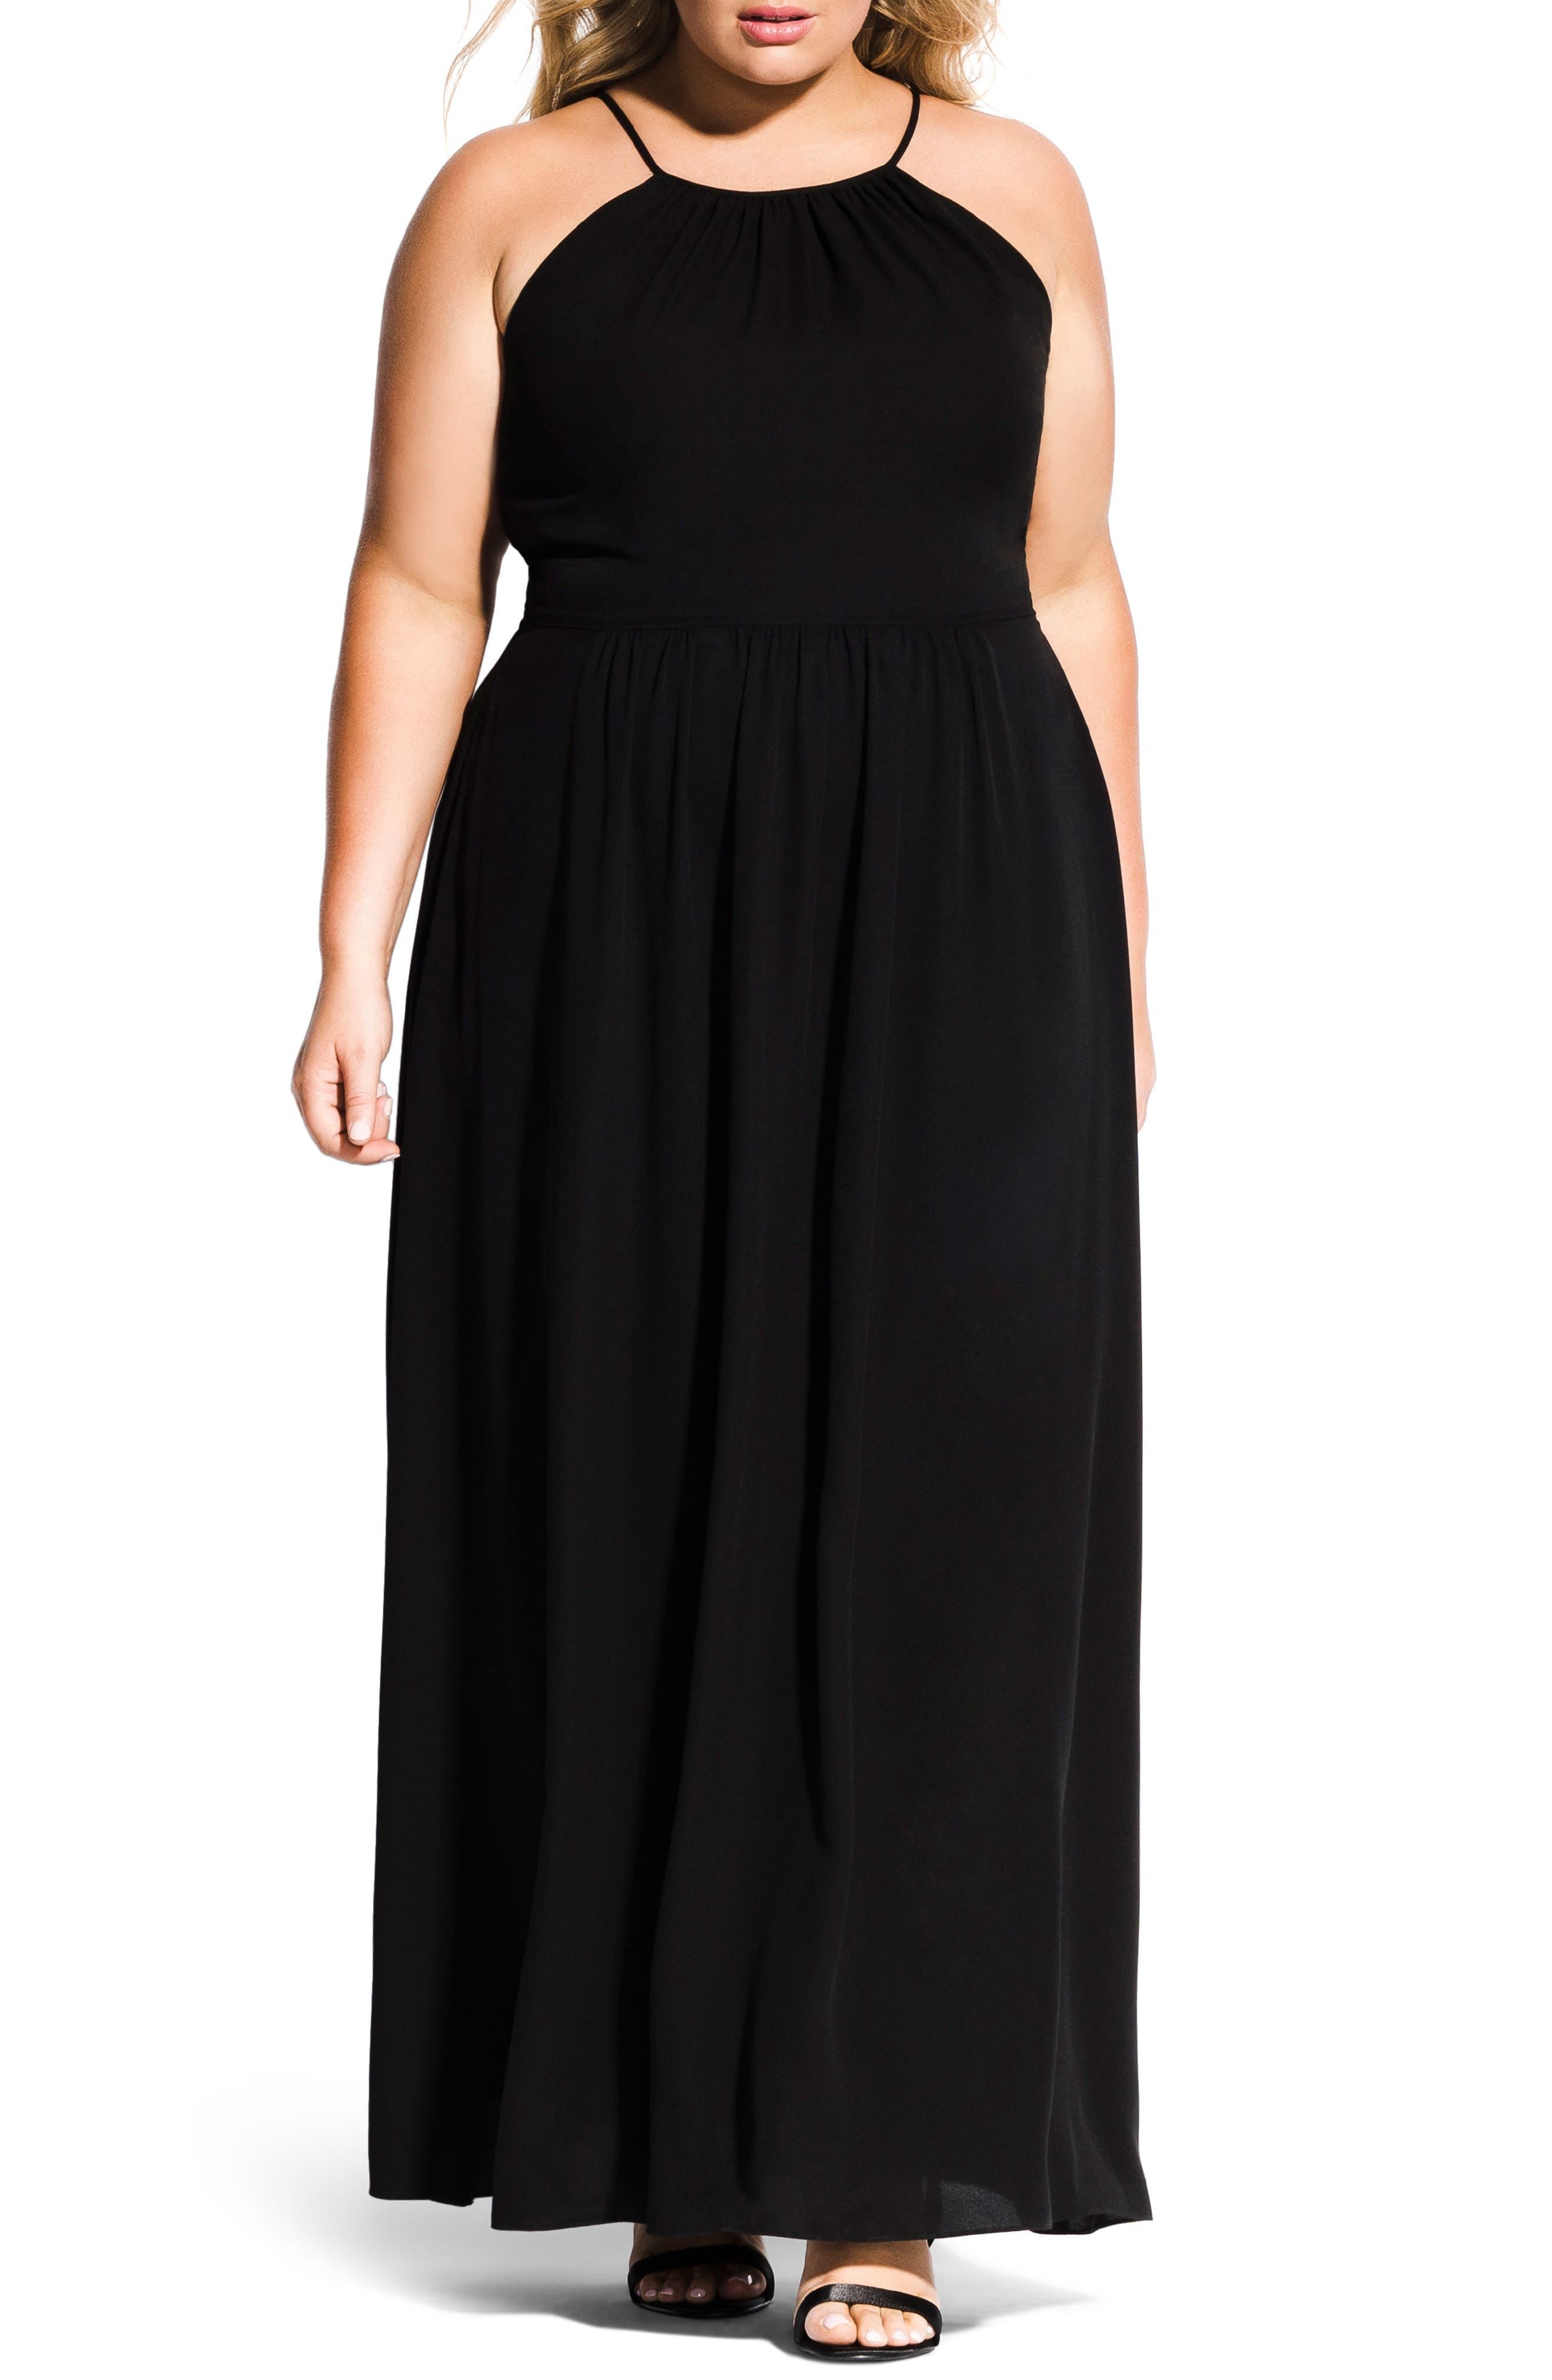 Devotion Maxi Dress,                             Main thumbnail 1, color,                             BLACK